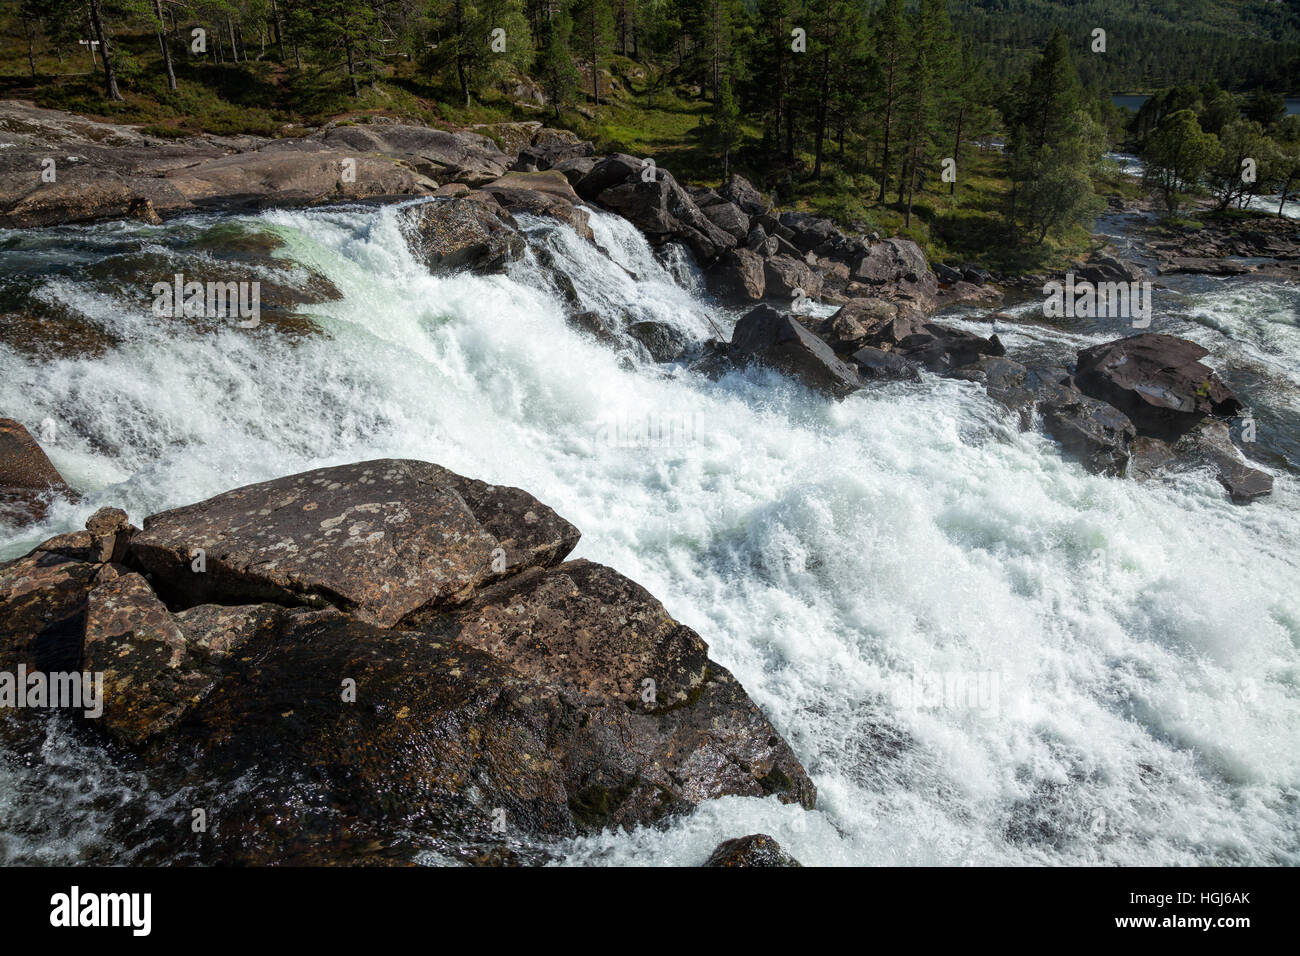 Wildwasser auf Rapid in Norwegen Stockbild